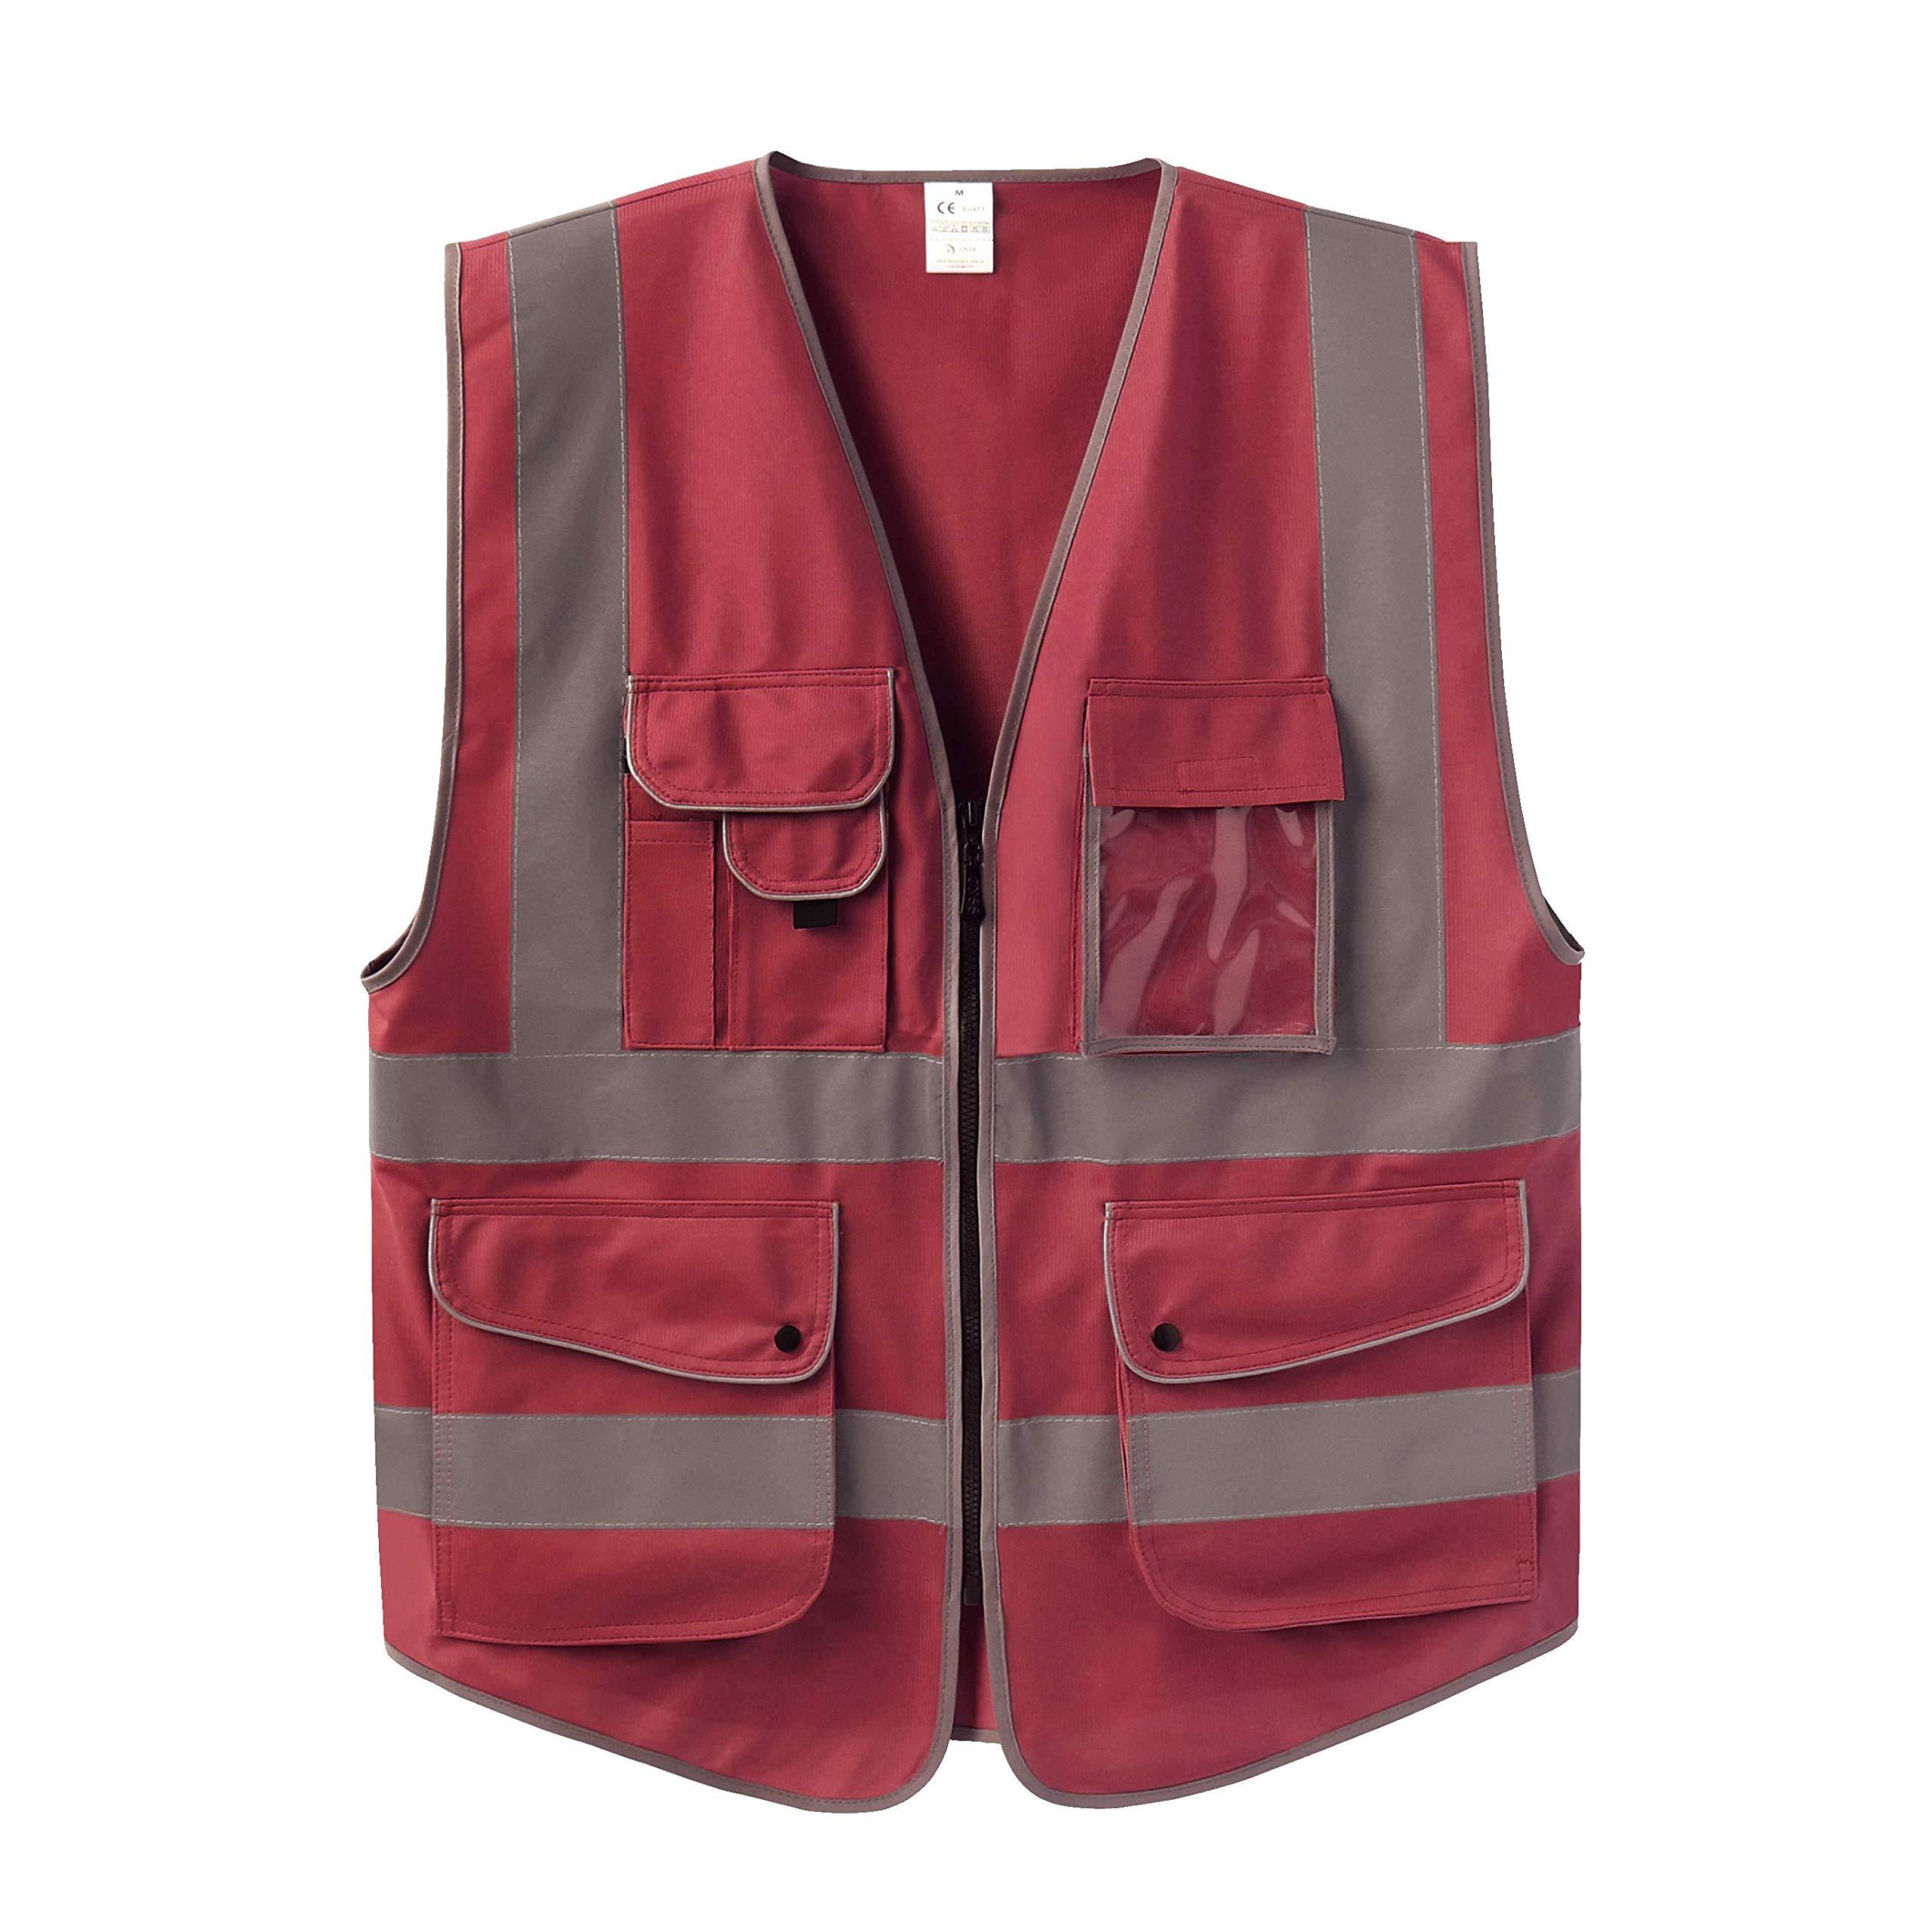 Uninova Safety Vest High Visibility - 9 Pockets Reflective Vest for Men & Women - ANSI/ISEA Standards (Small, Red)